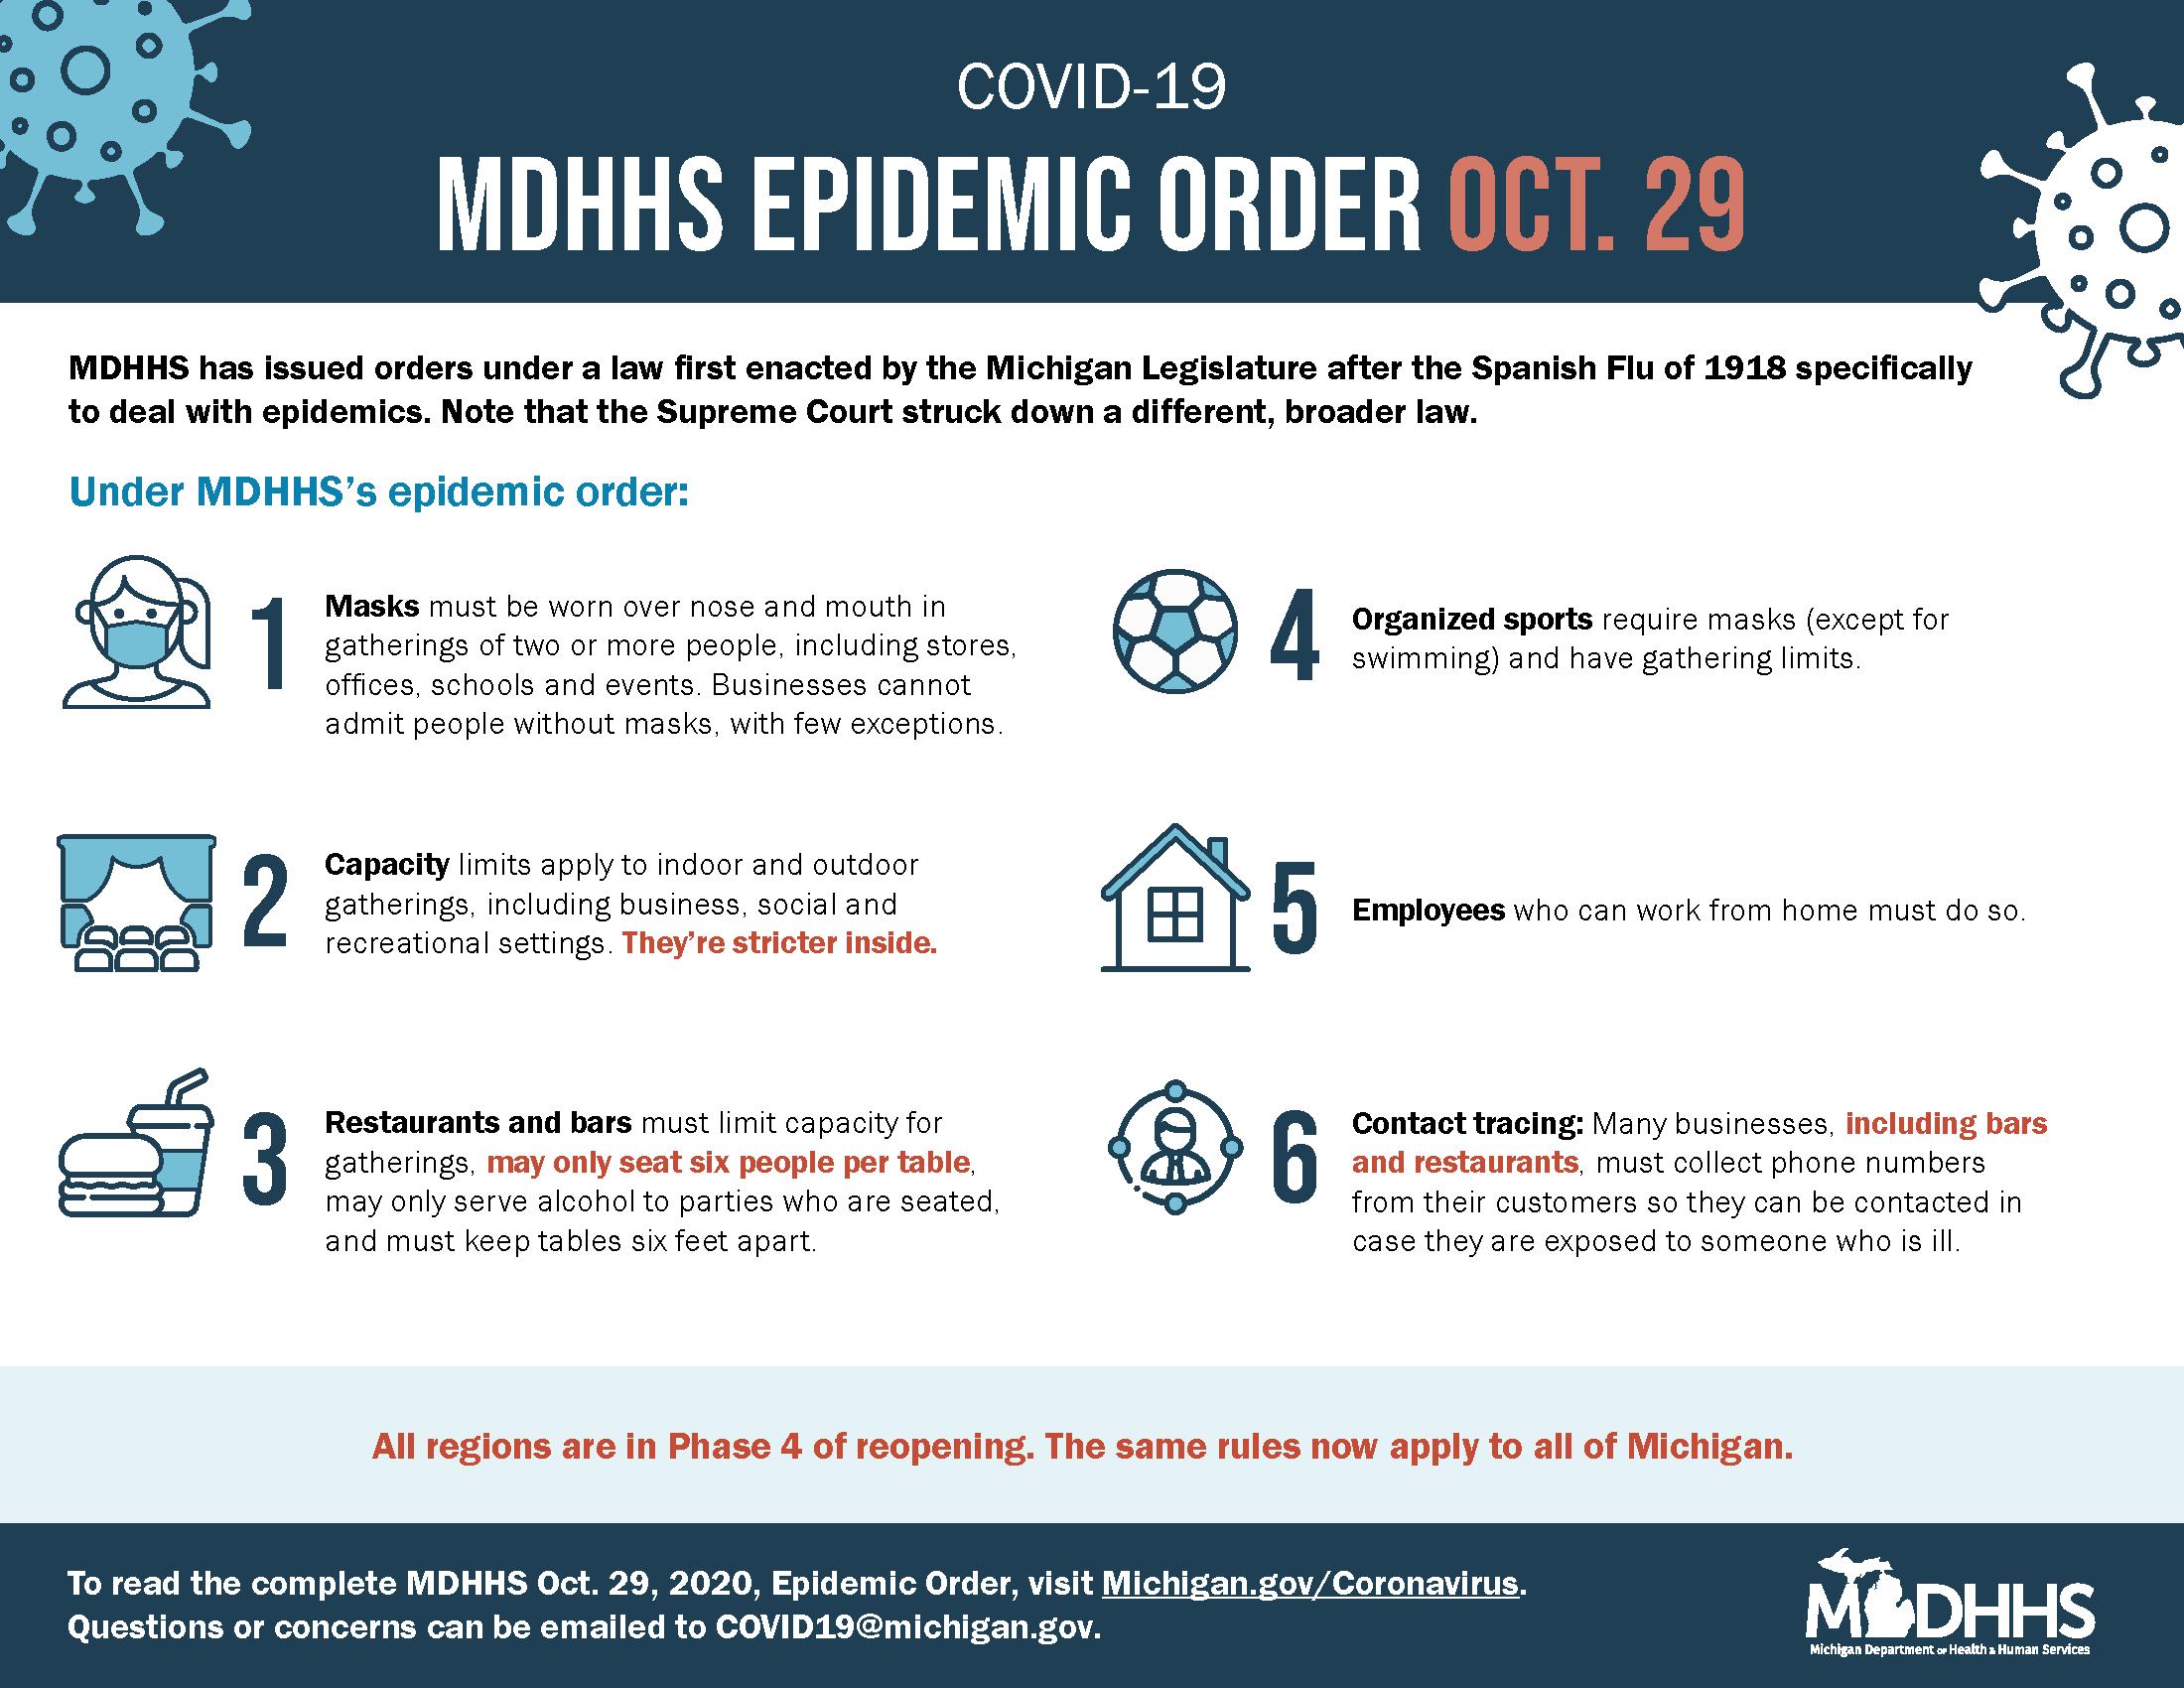 MDHHS Epidemic Order